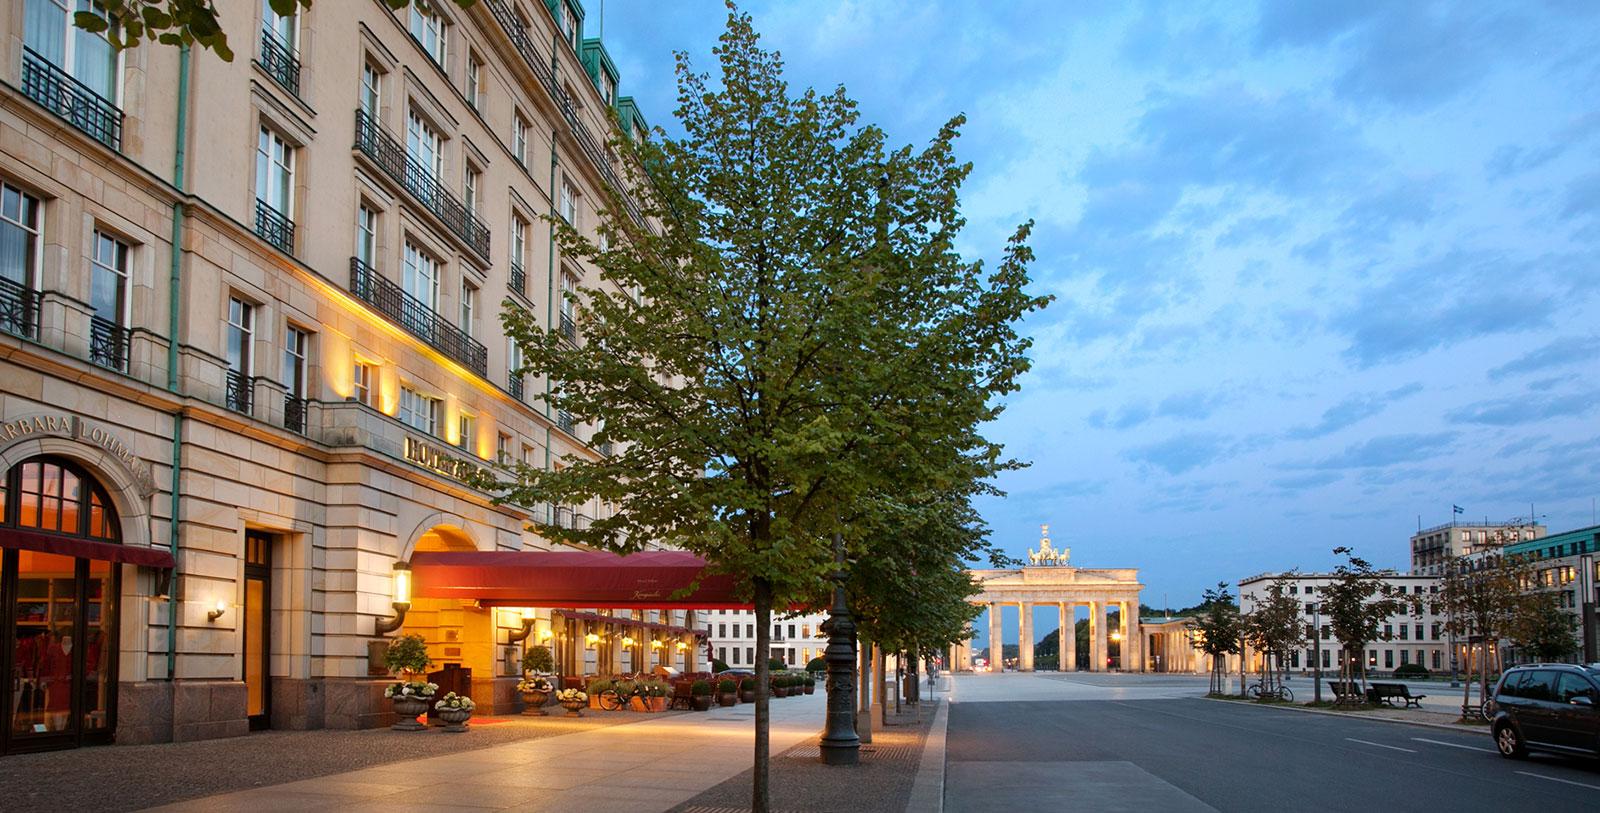 Image of Night Exterior, Hotel Adlon Kempinski, Berlin, Germany, 1907, Member of Historic Hotels Worldwide, History